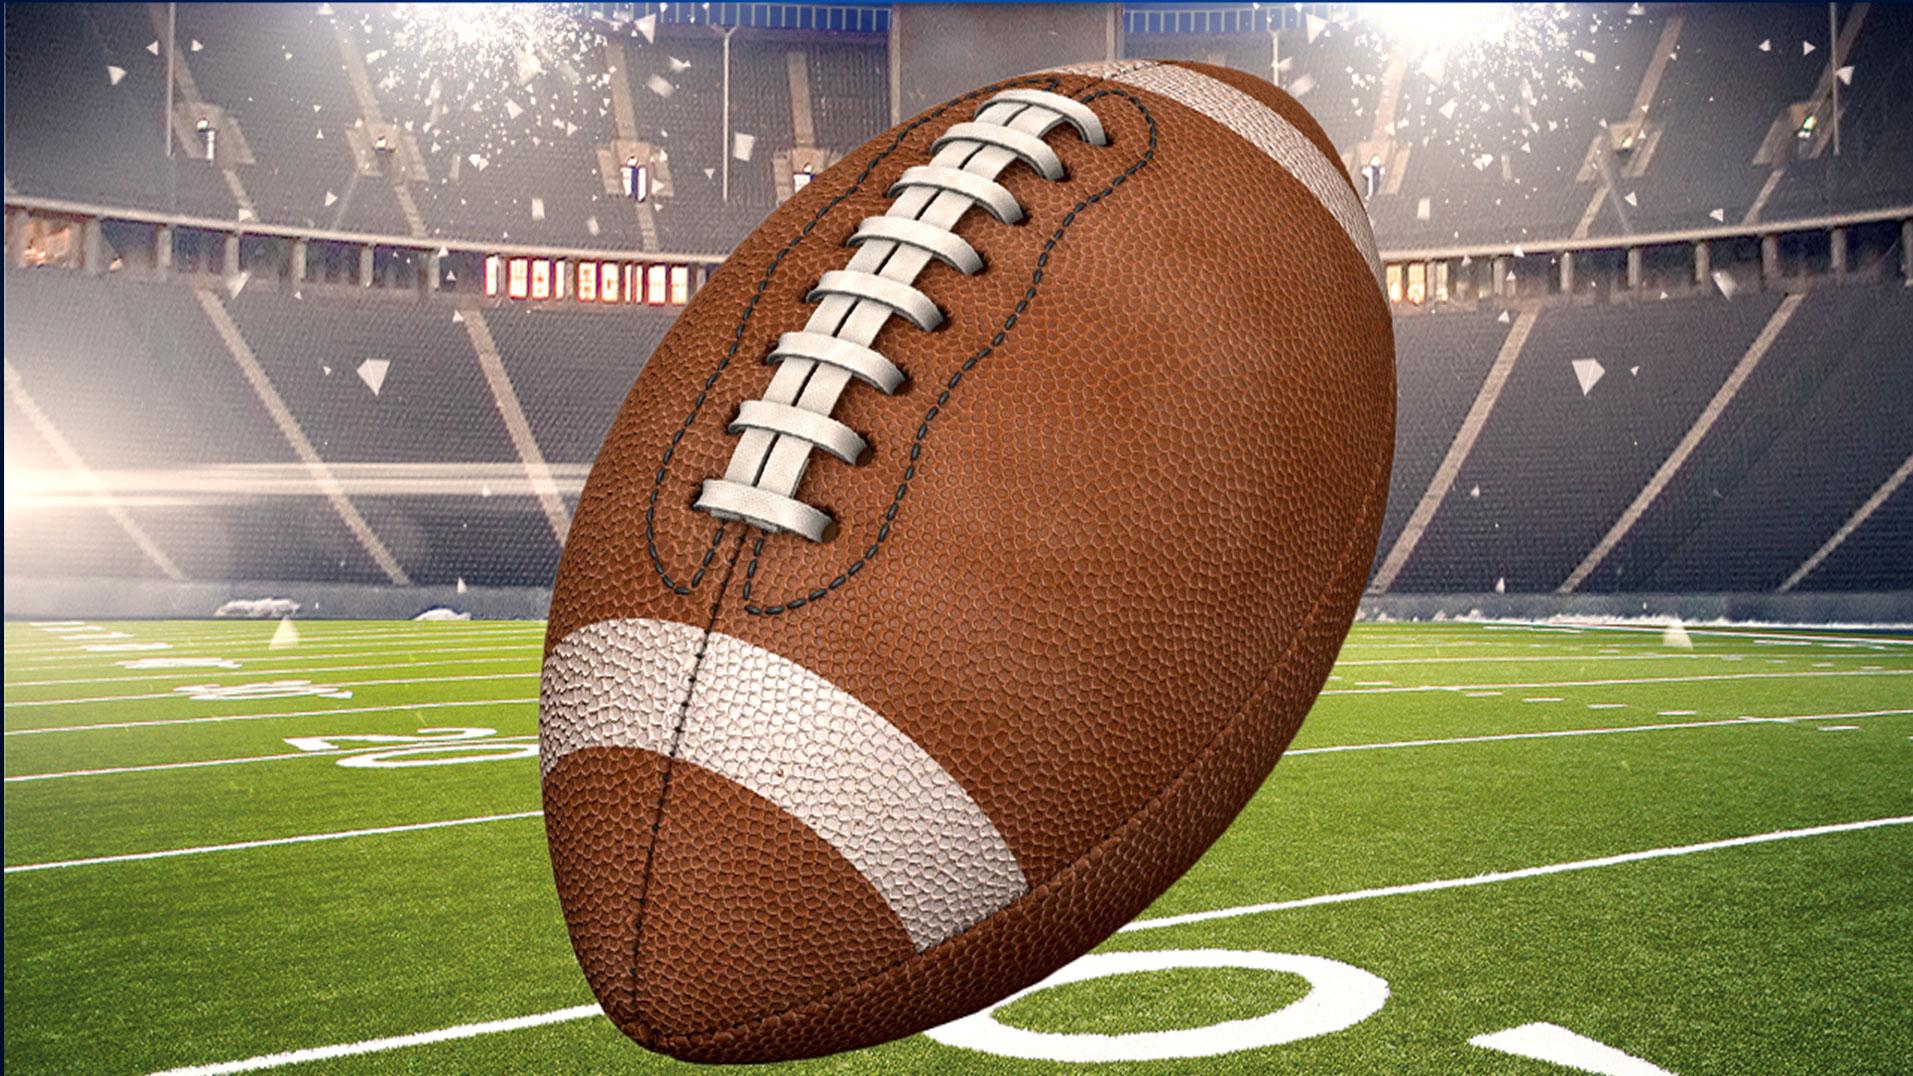 KELO-sports-generic-football_1529437981732.jpg